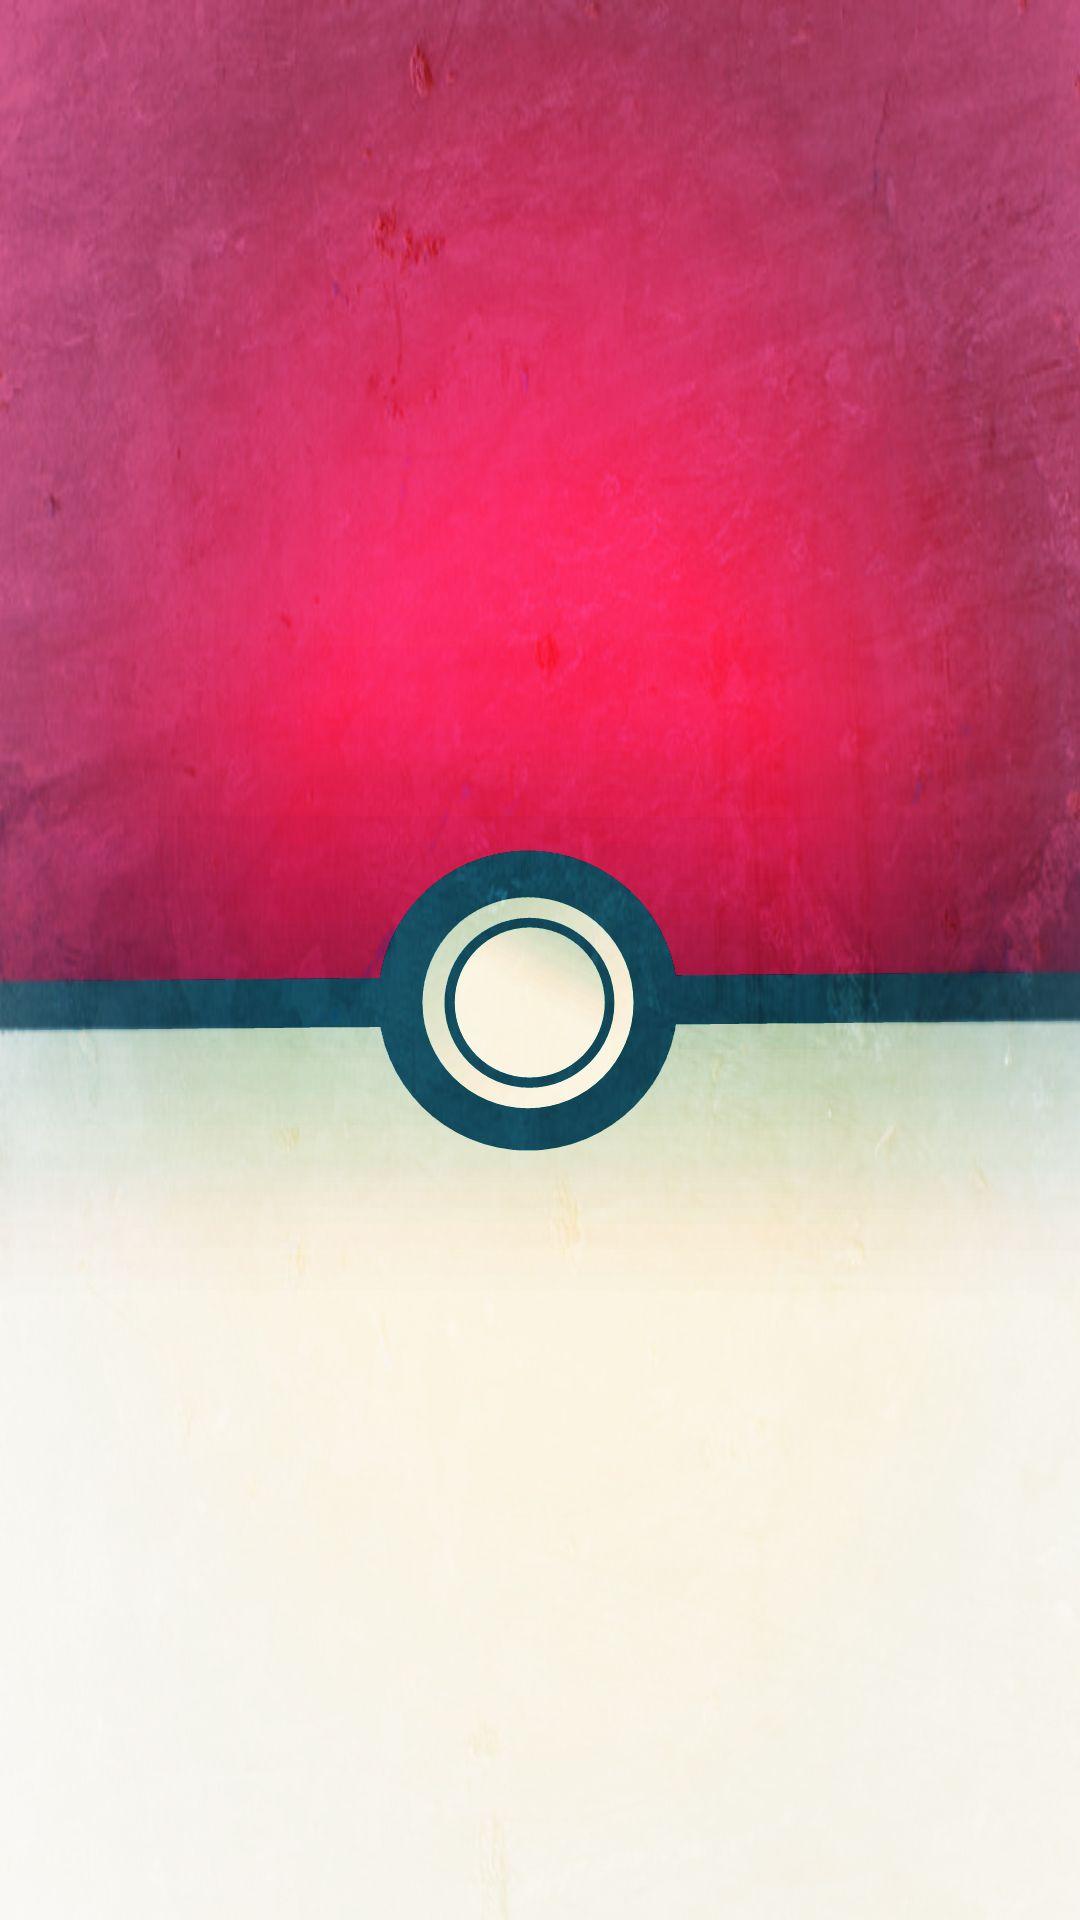 Pokeball Wallpaper By Trance722 Iphone Wallpapers 4 Pokemon